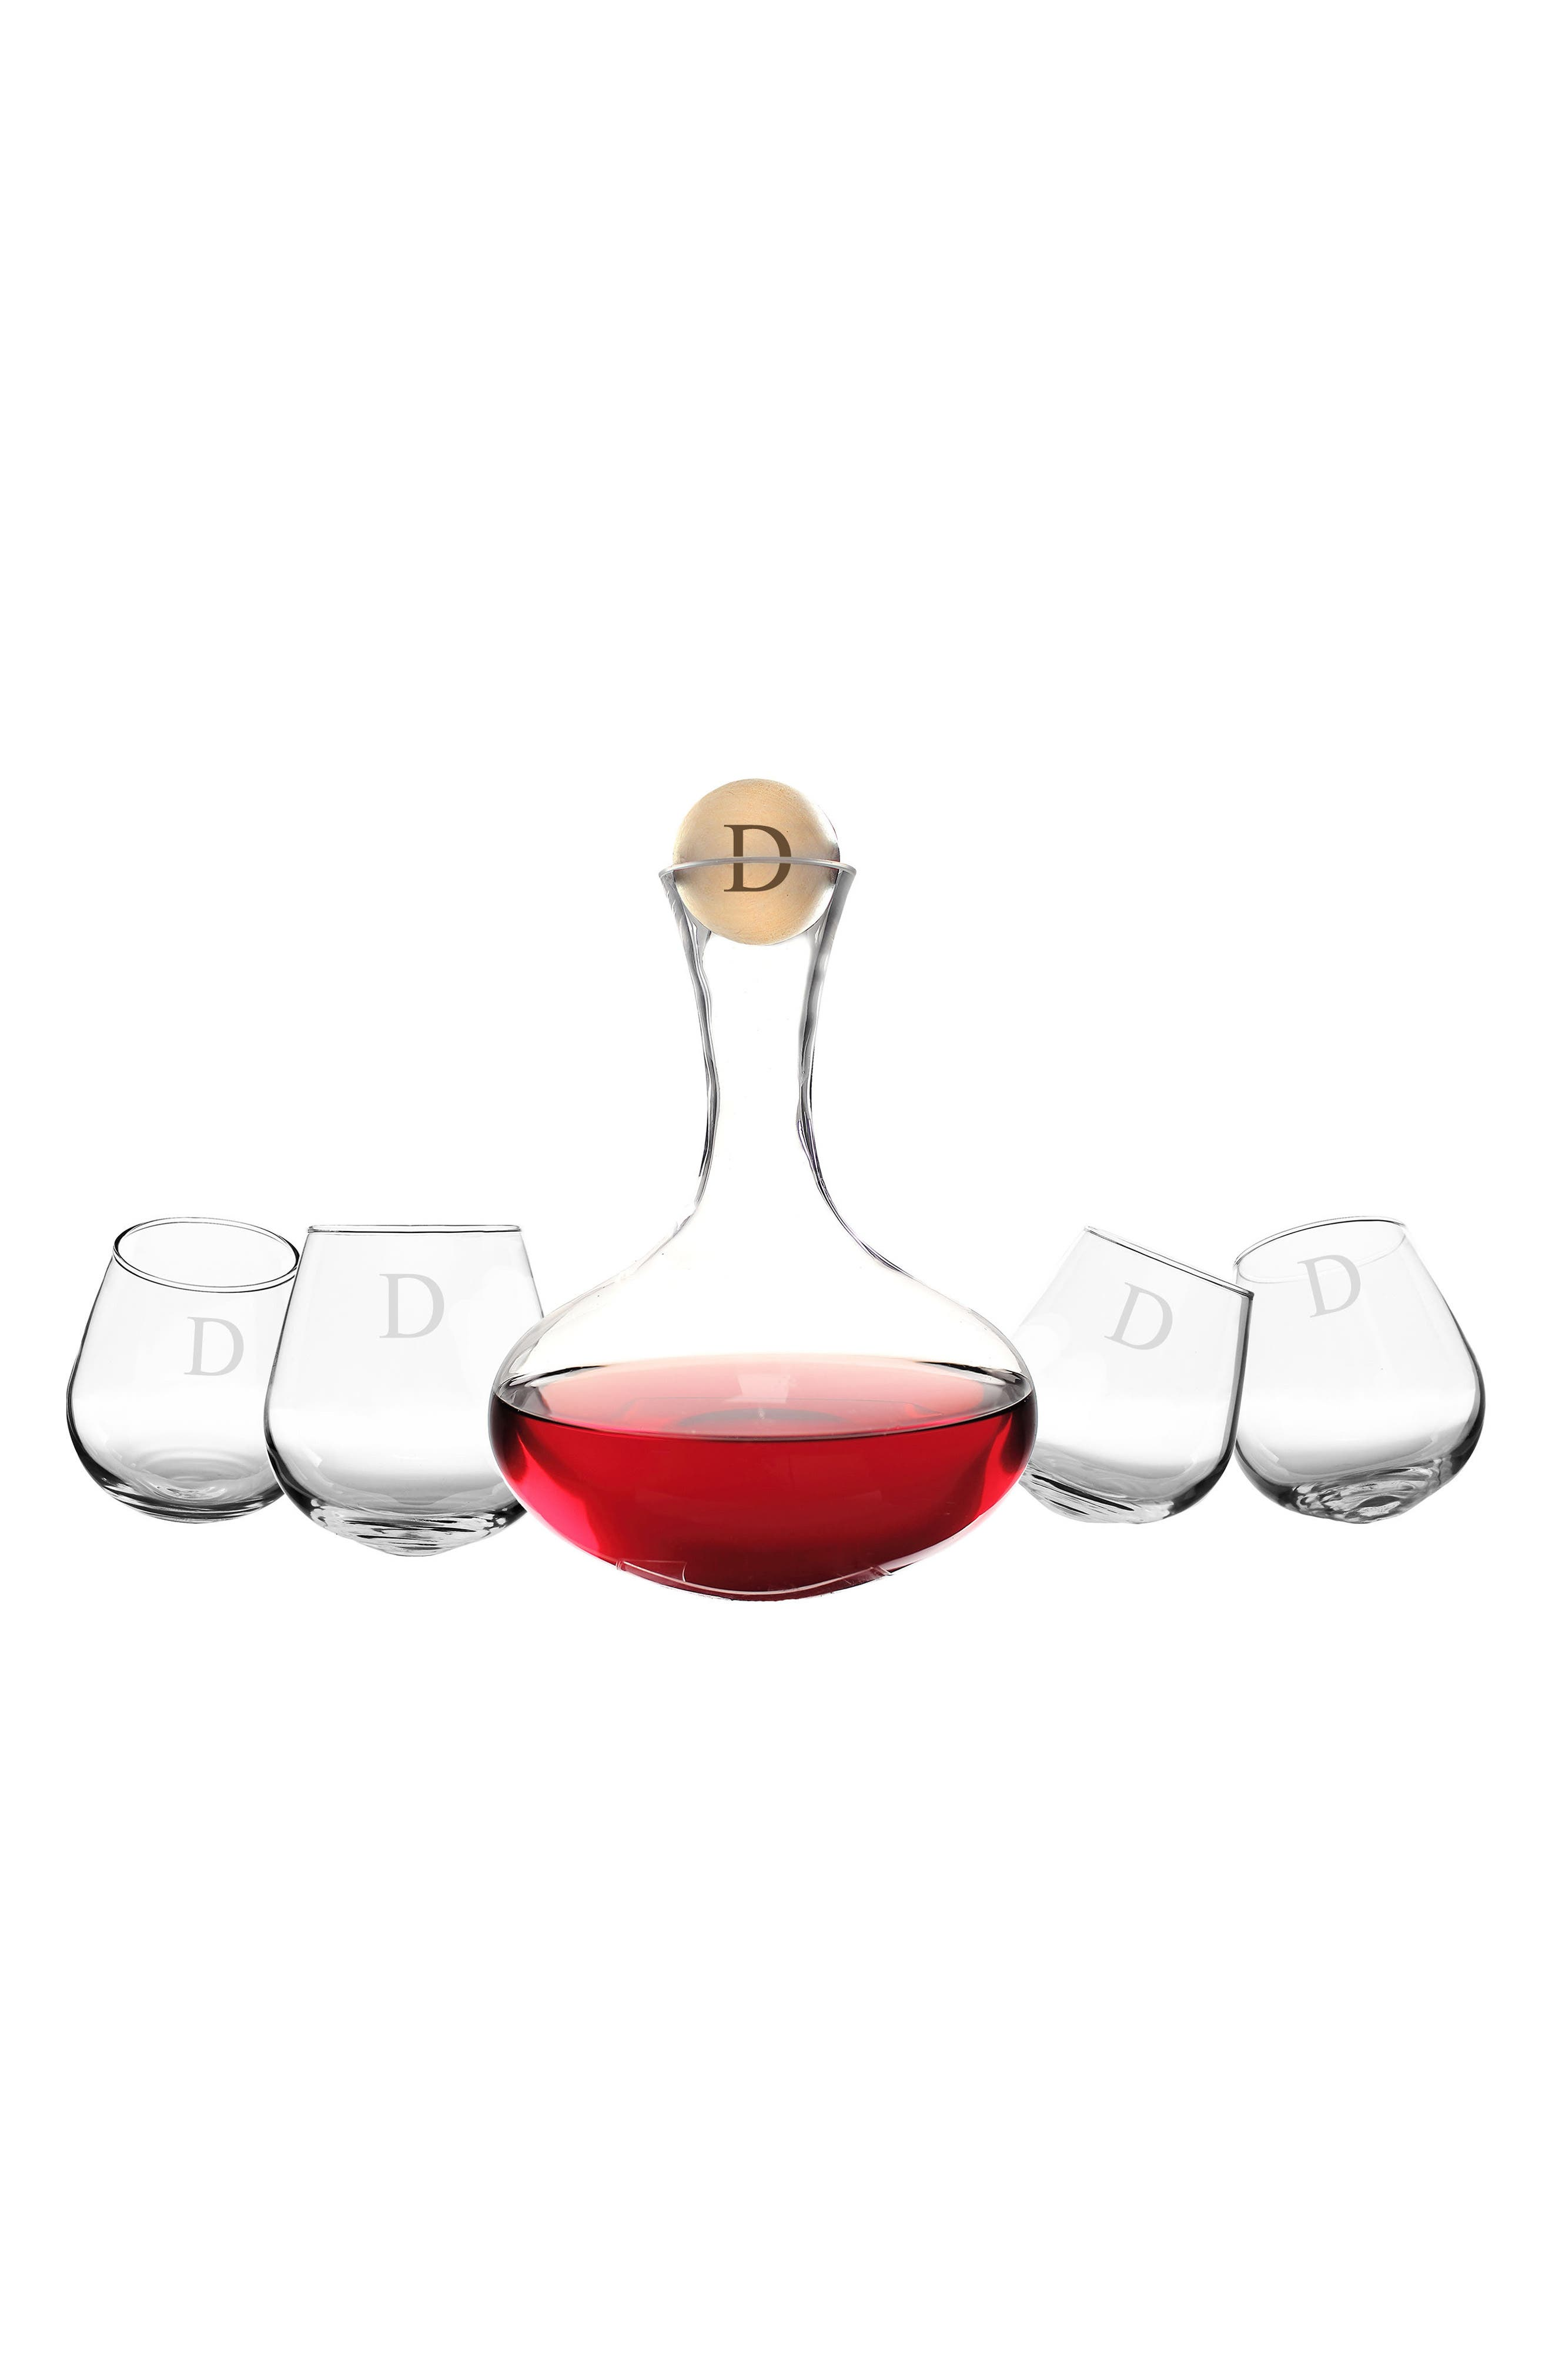 'Tipsy' Monogram Wine Decanter & Stemless Glasses,                         Main,                         color, D